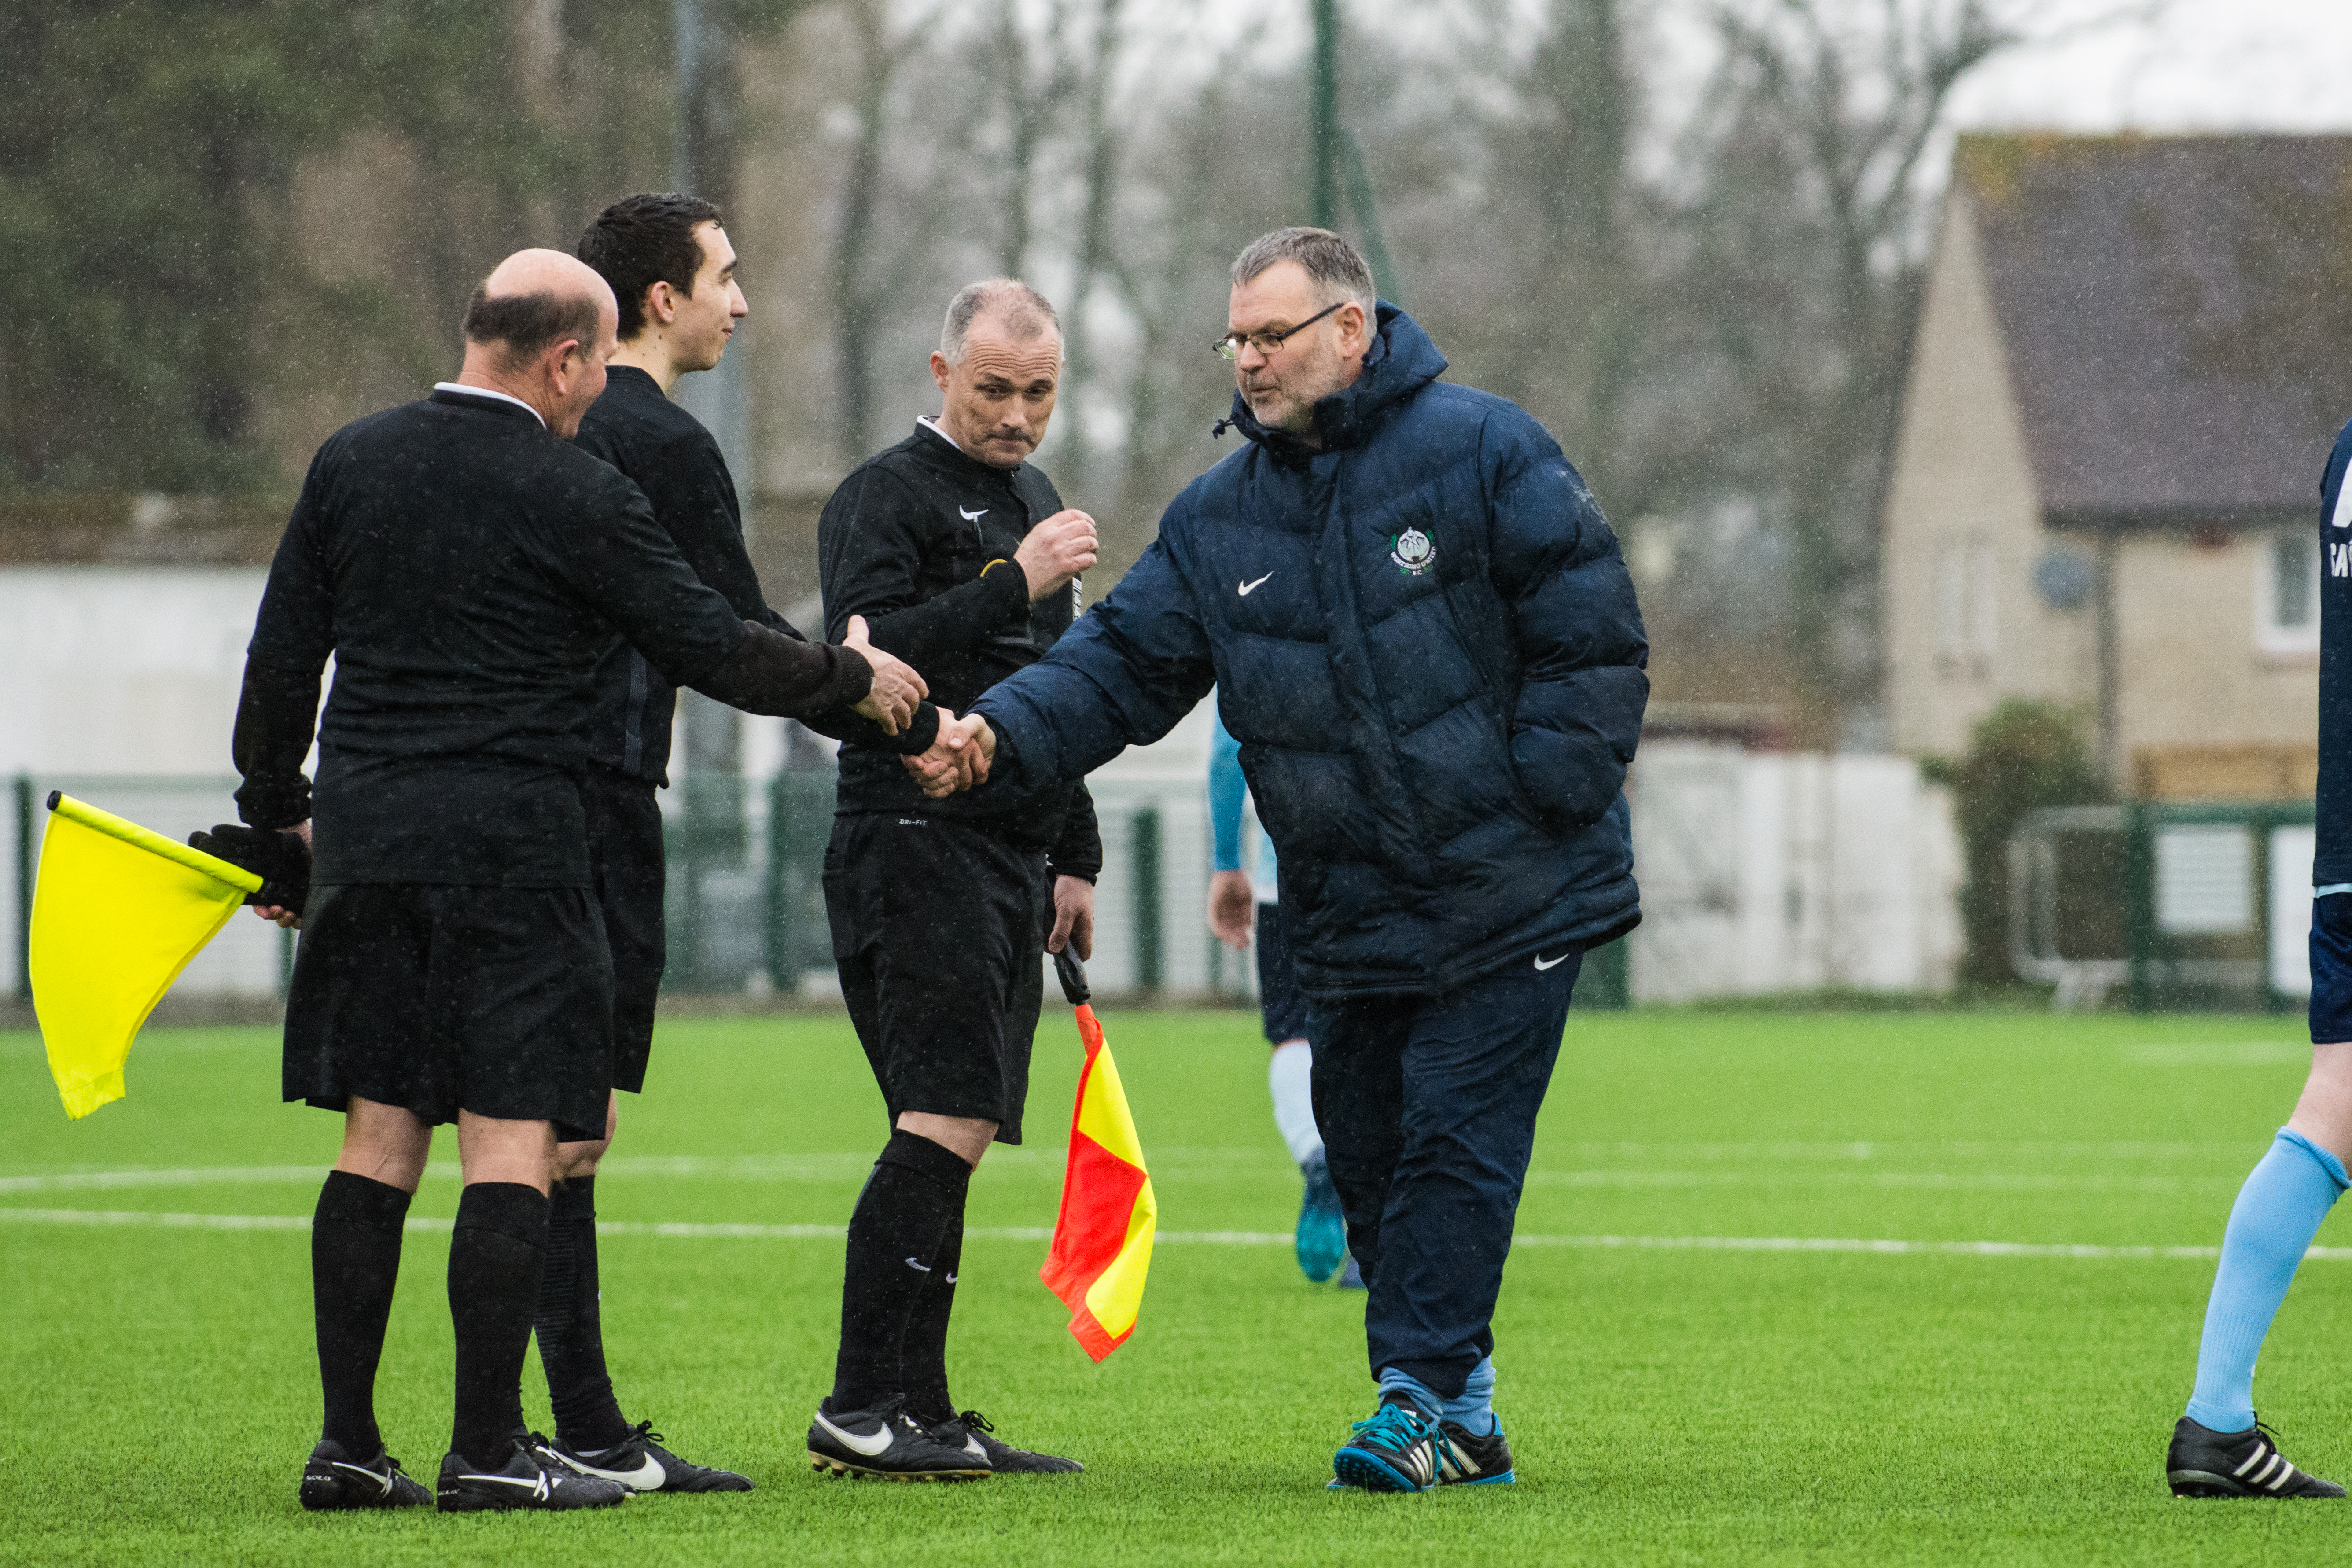 DAVID_JEFFERY Worthing United FC vs East Preston FC 02.04.18 111